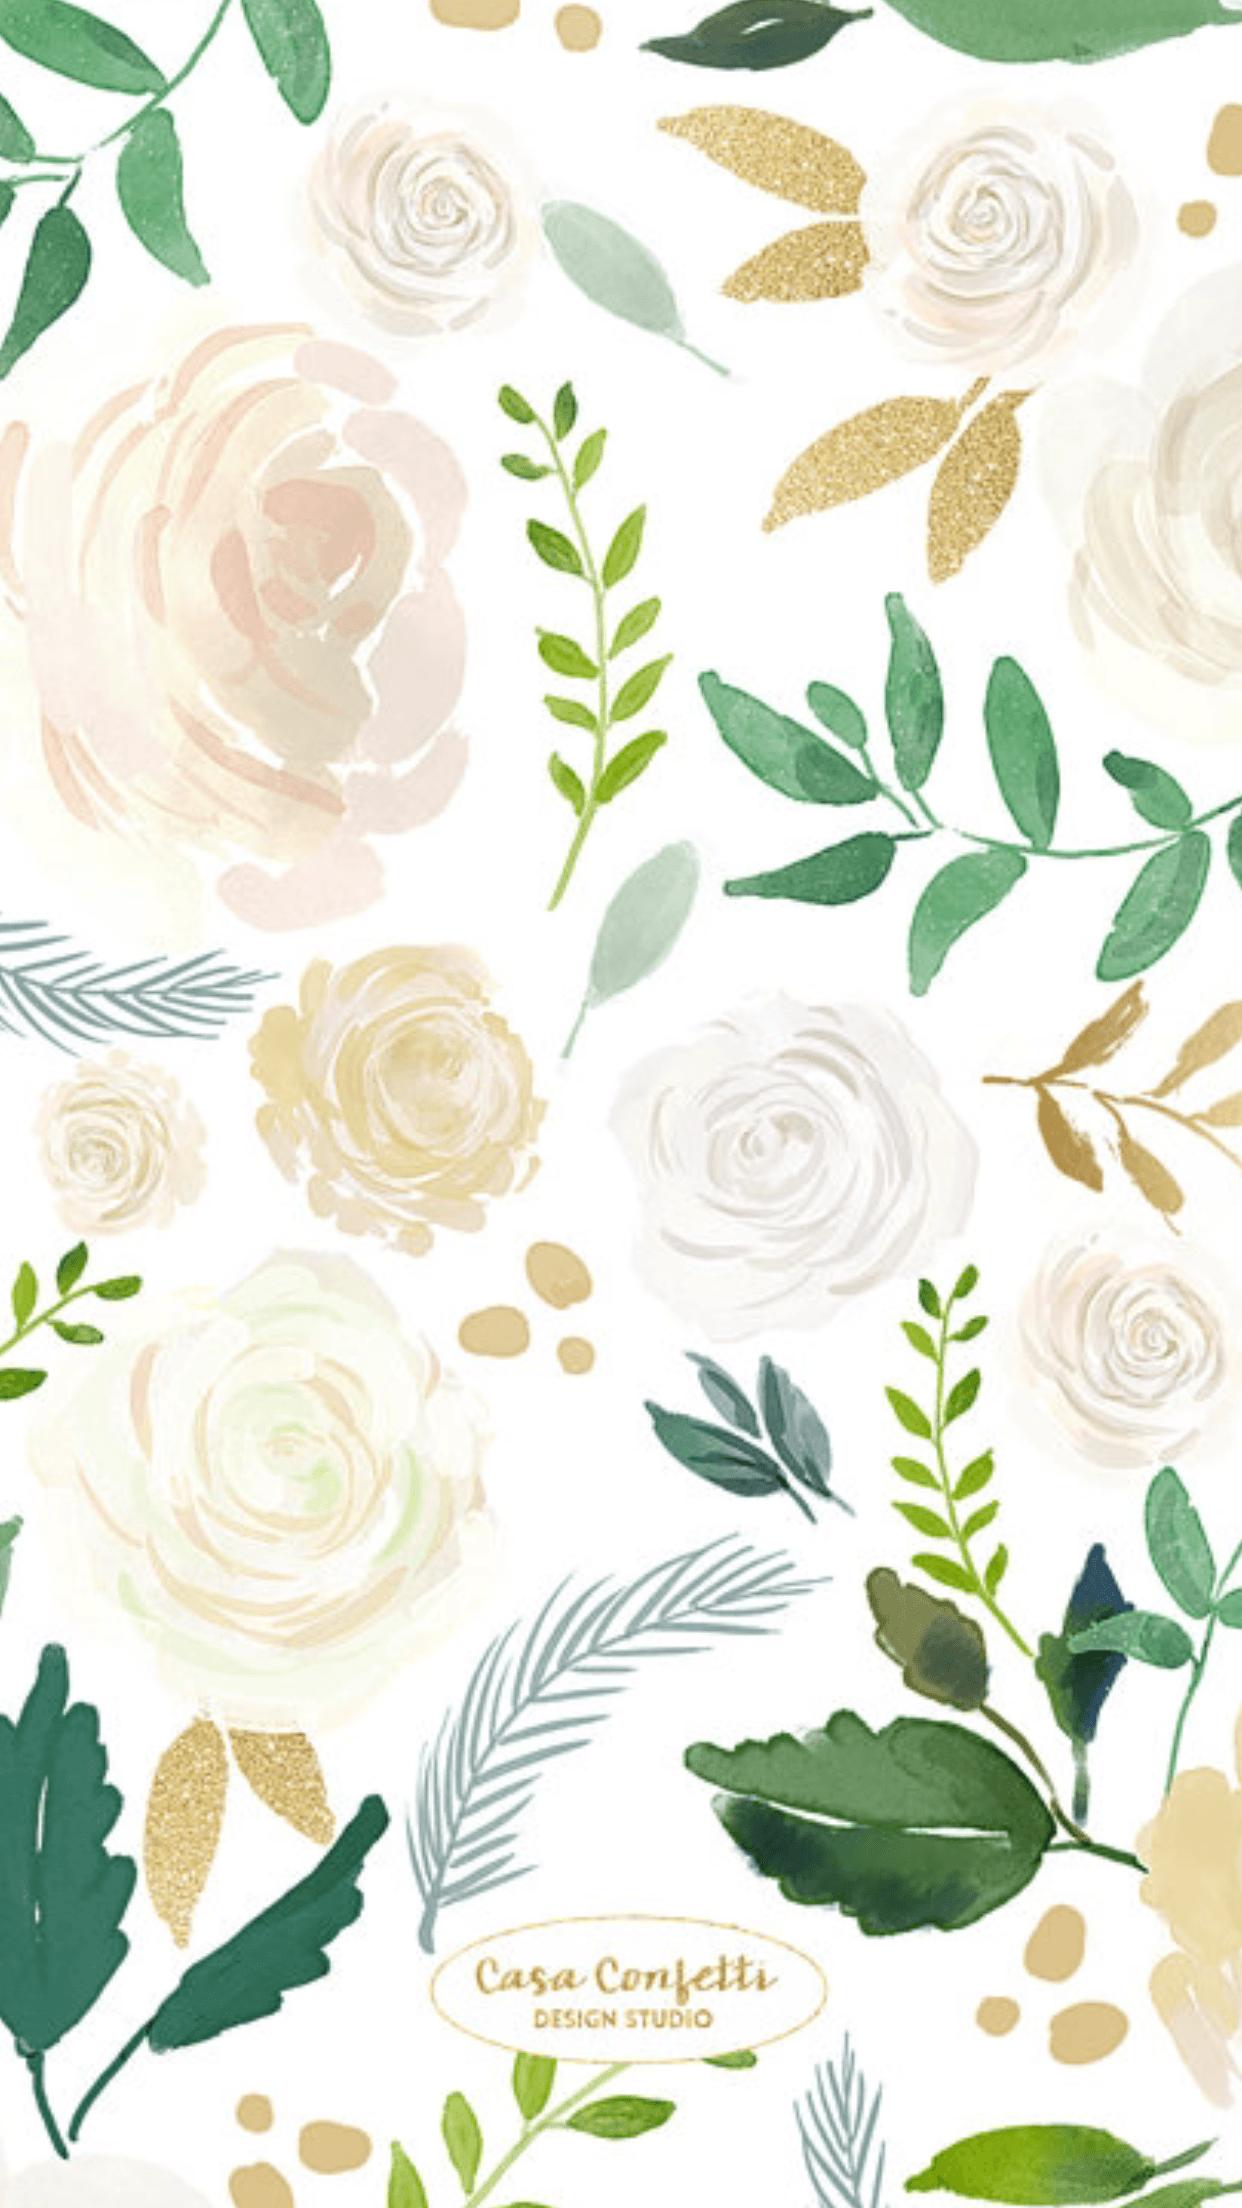 Watercolor Flower Iphone Wallpapers Top Free Watercolor